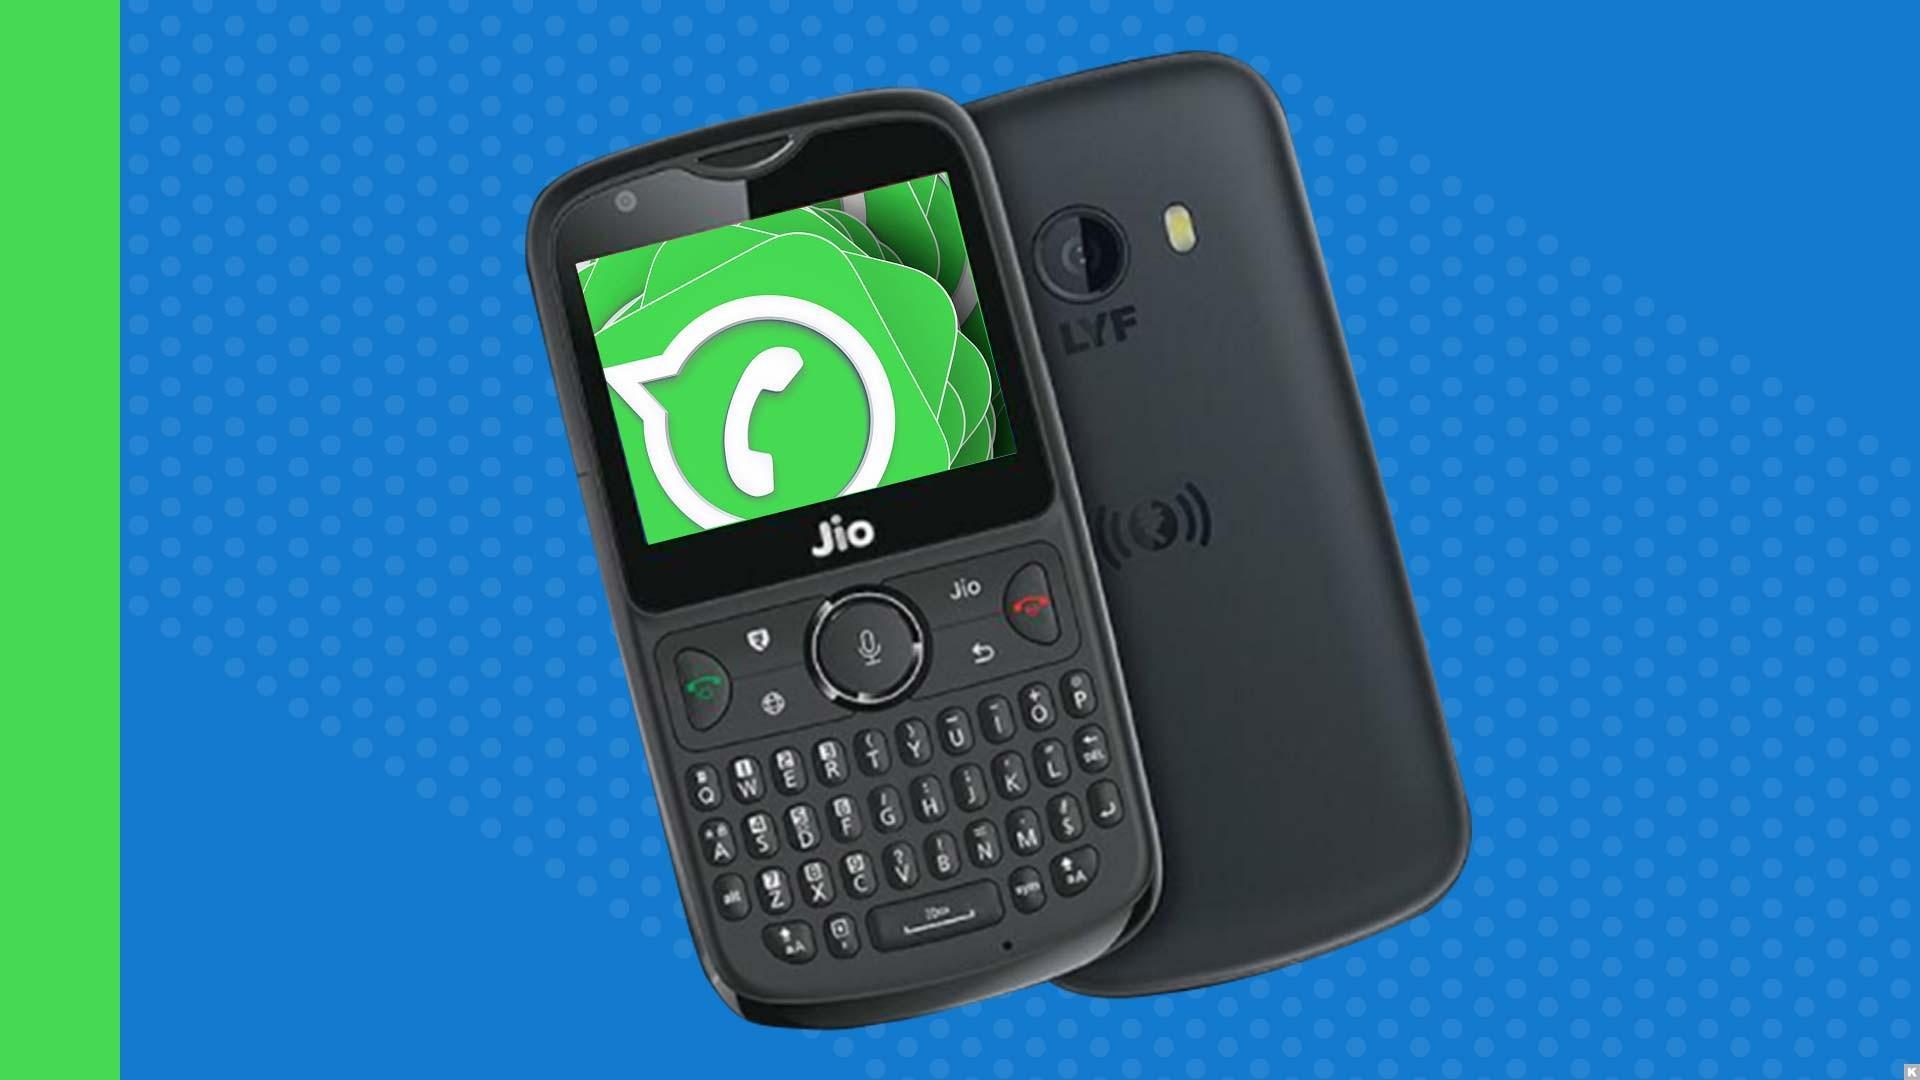 whatsapp razrabotali soft dlya os kaios i telefonov jiophone